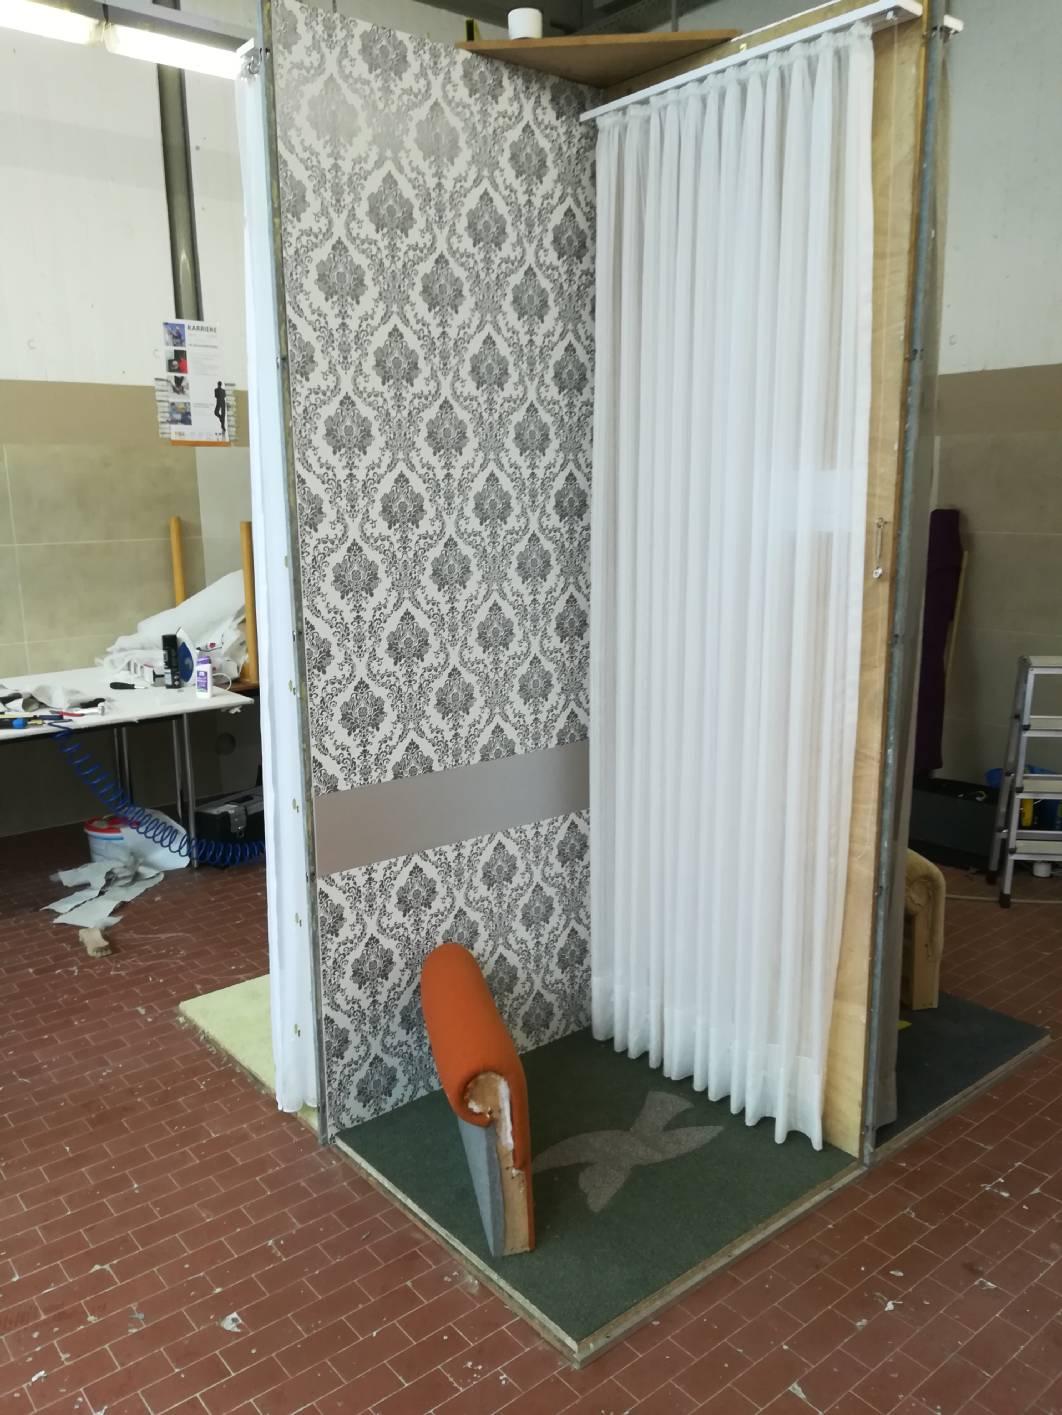 Raumausstatter Bielefeld innung bielefeld lippe ihr raumausstatter in bielefeld ausbildung